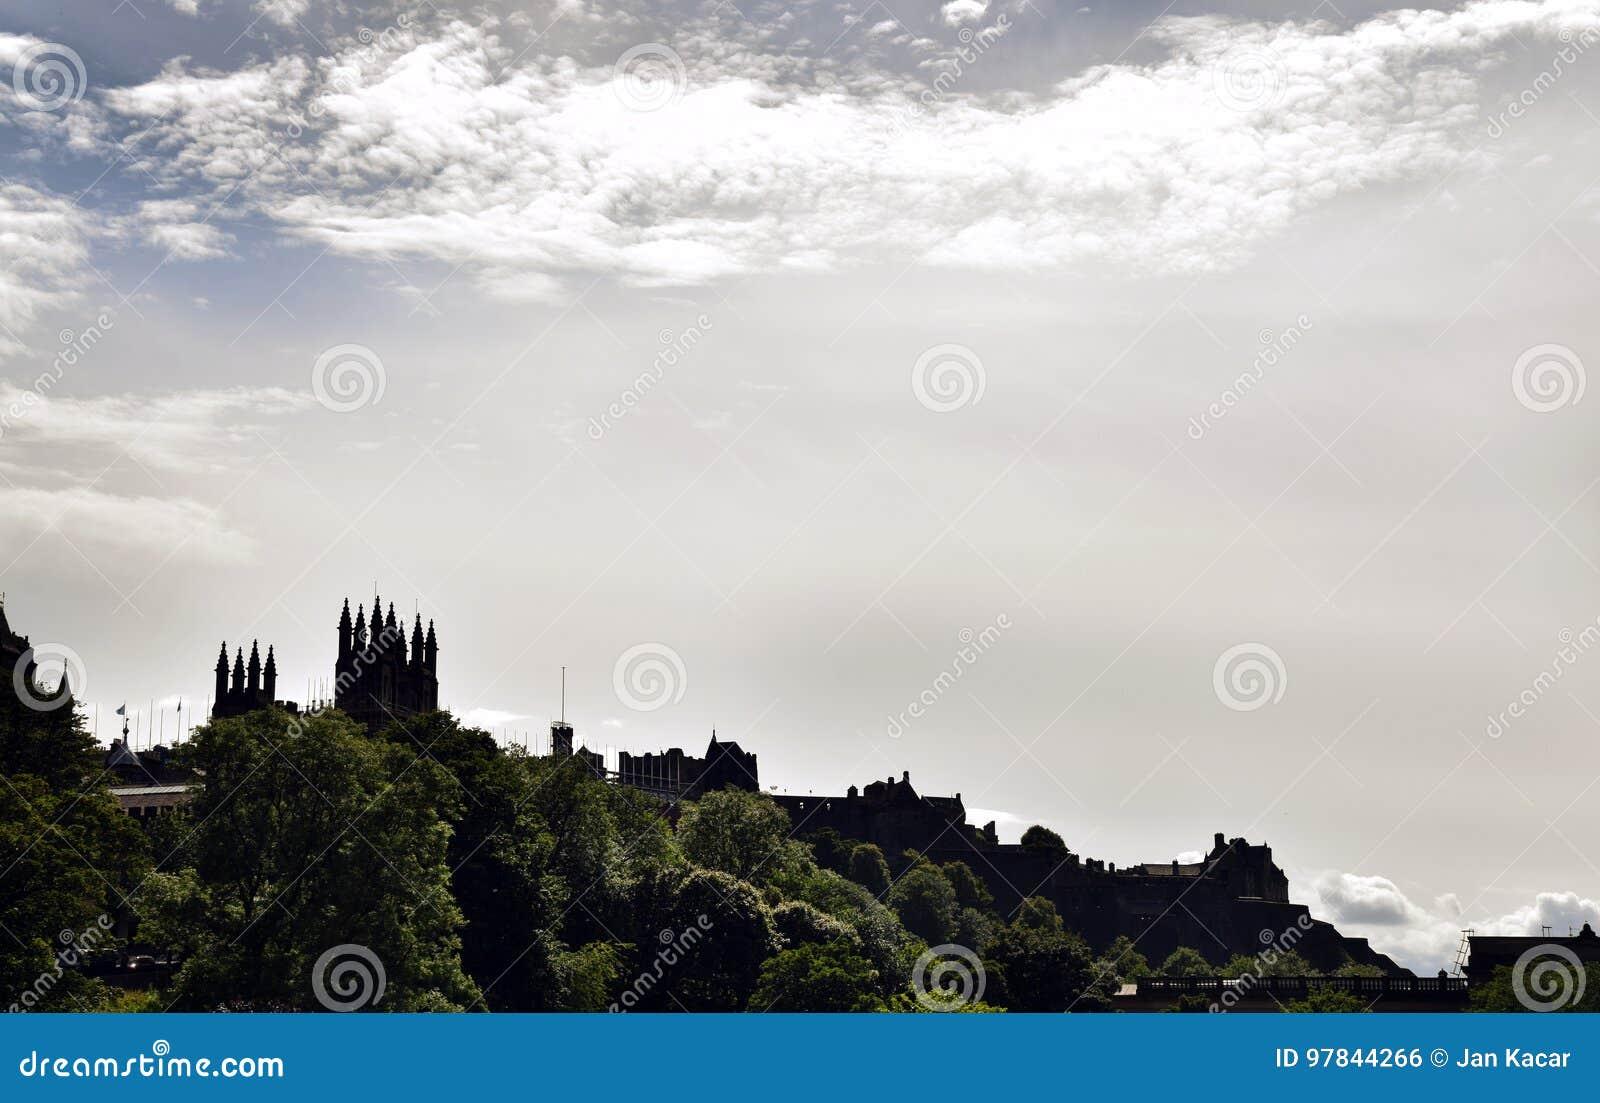 Cityscape van Edinburgh